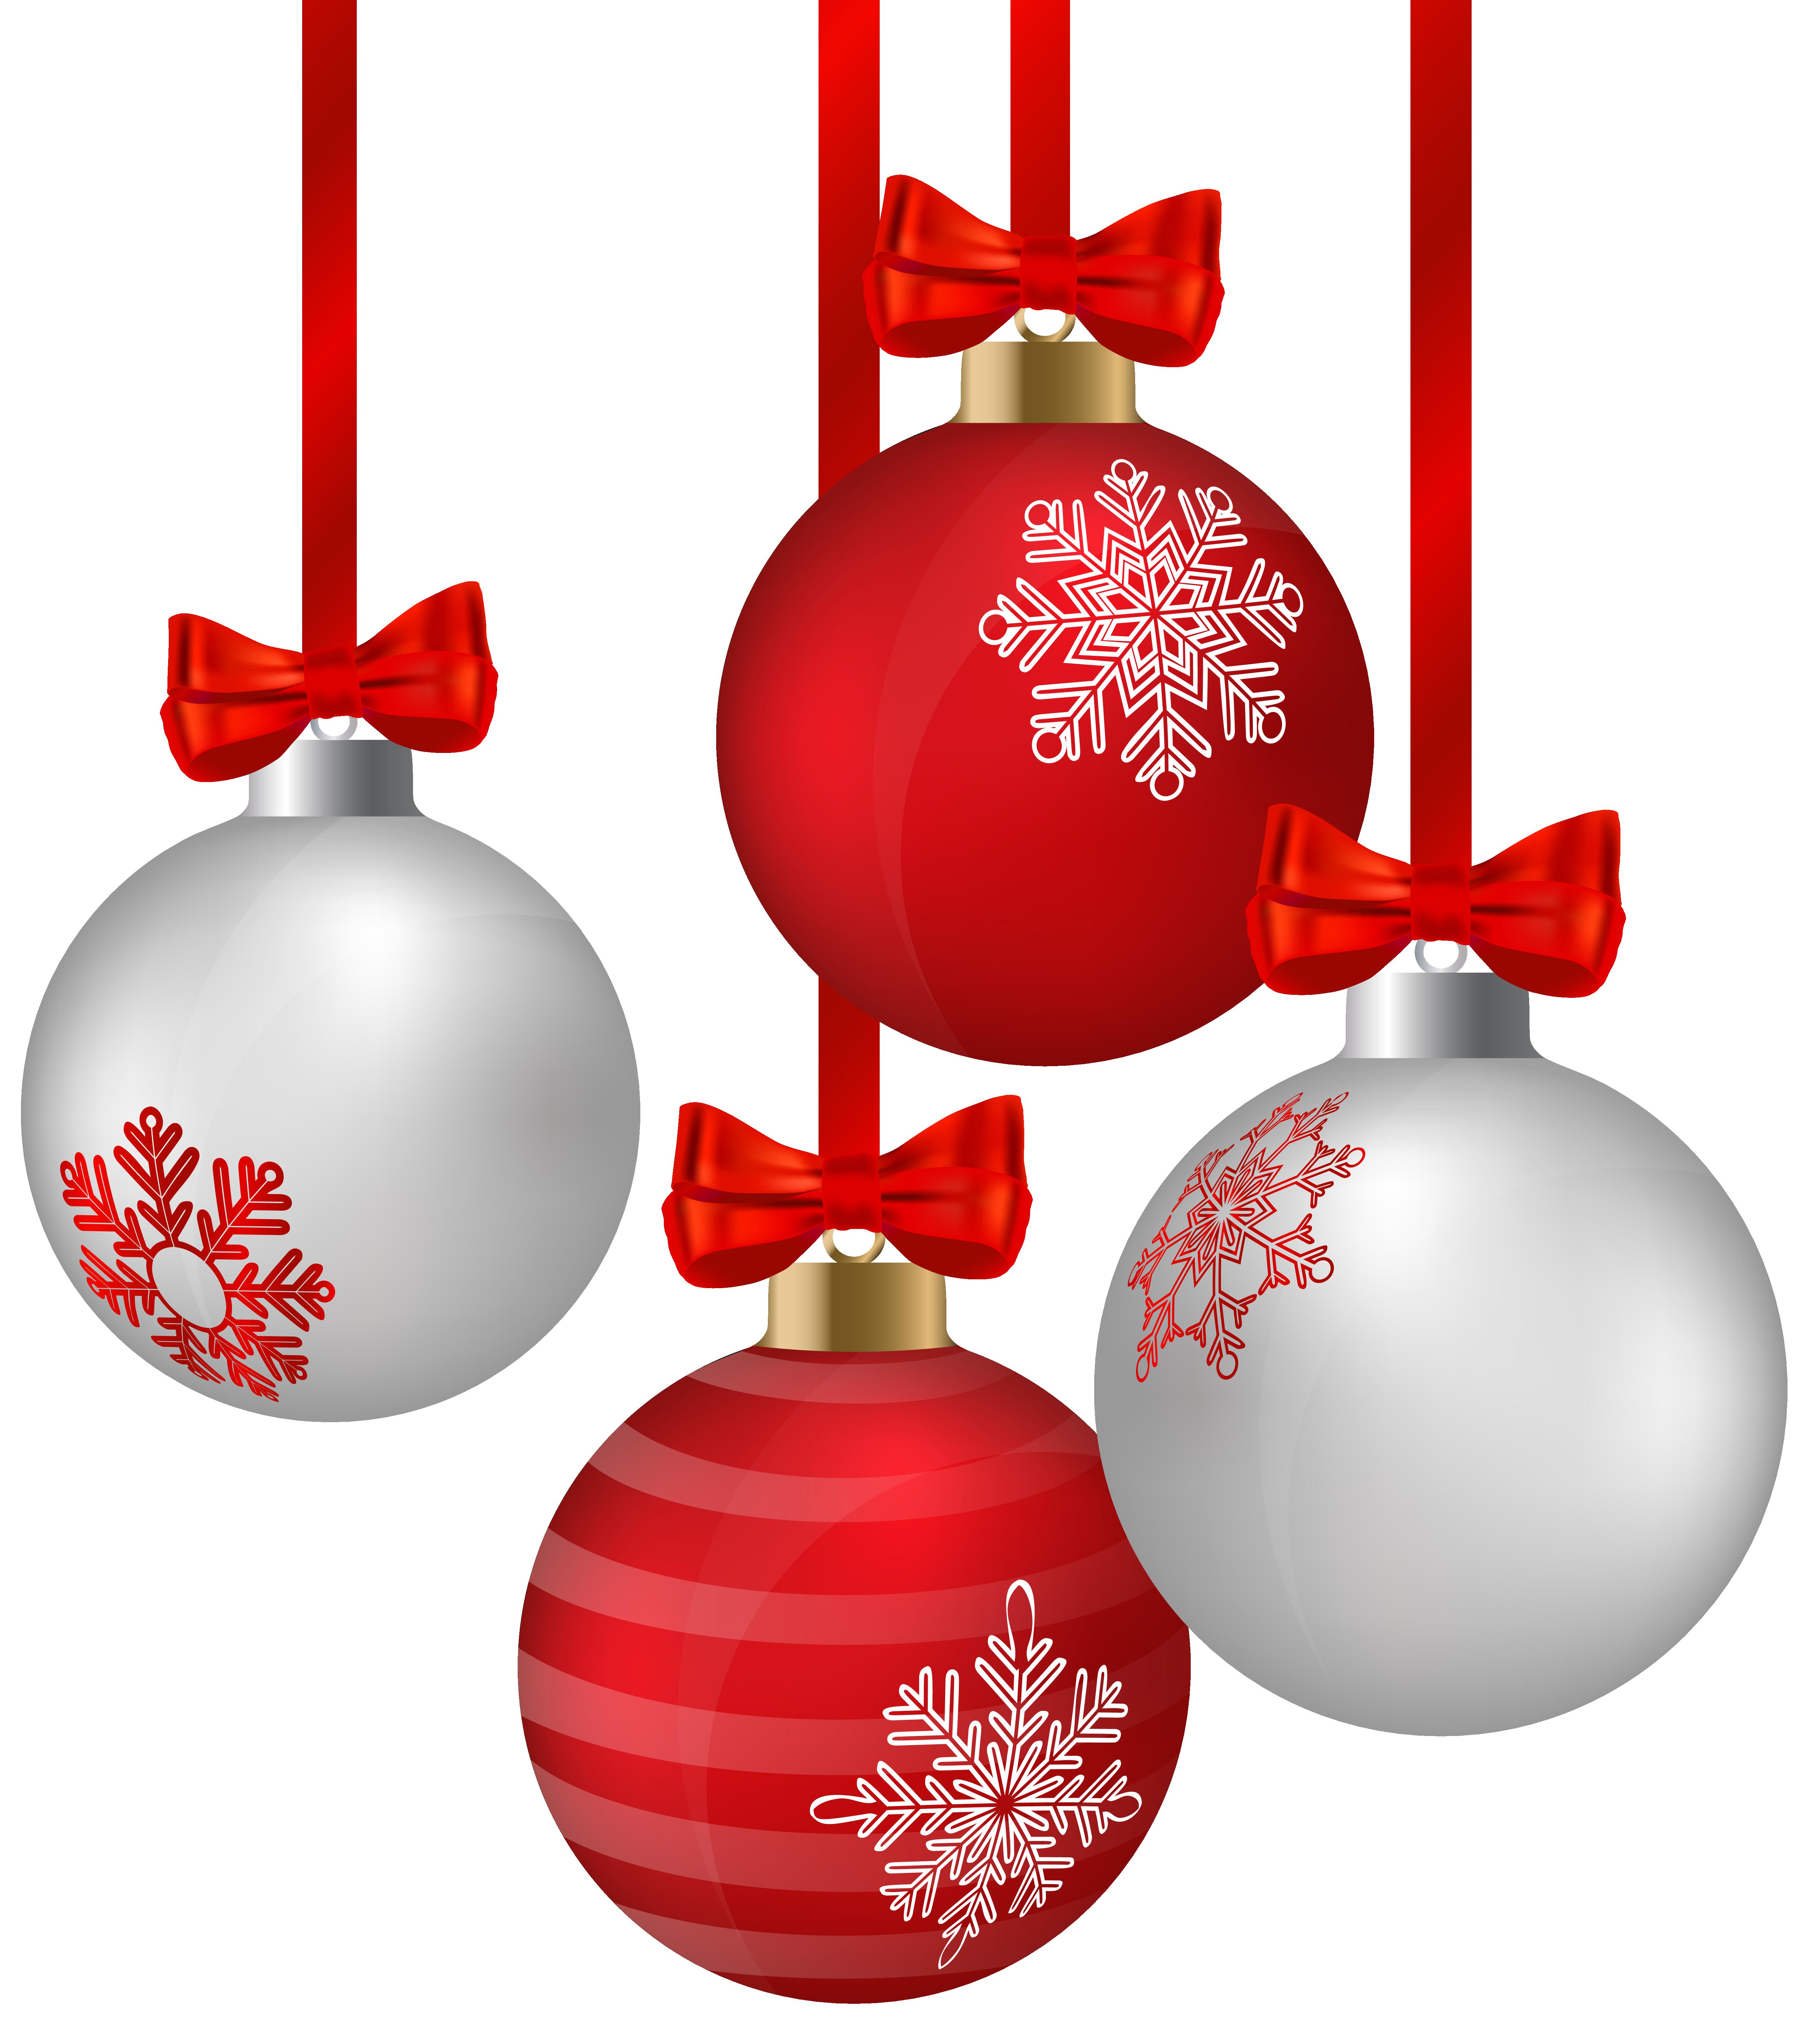 Christmas Ornament PNG Transparent Christmas Ornament.PNG.